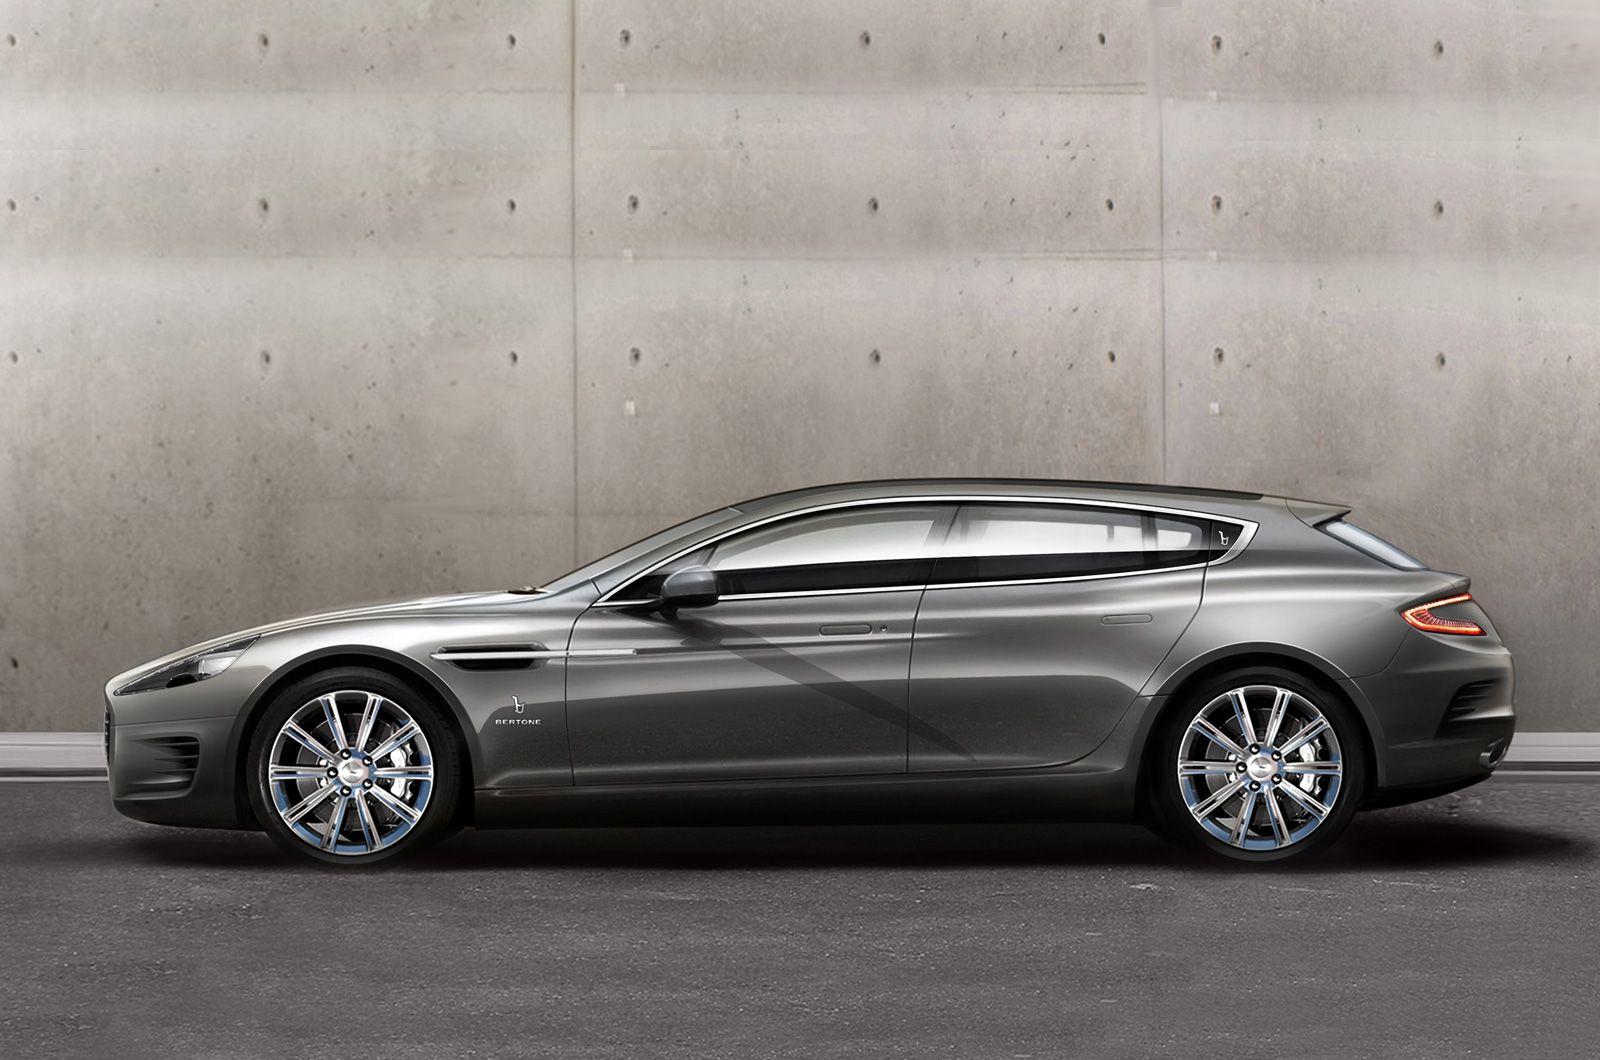 Geneva motor show bertone jet aston martin rapide shooting brake